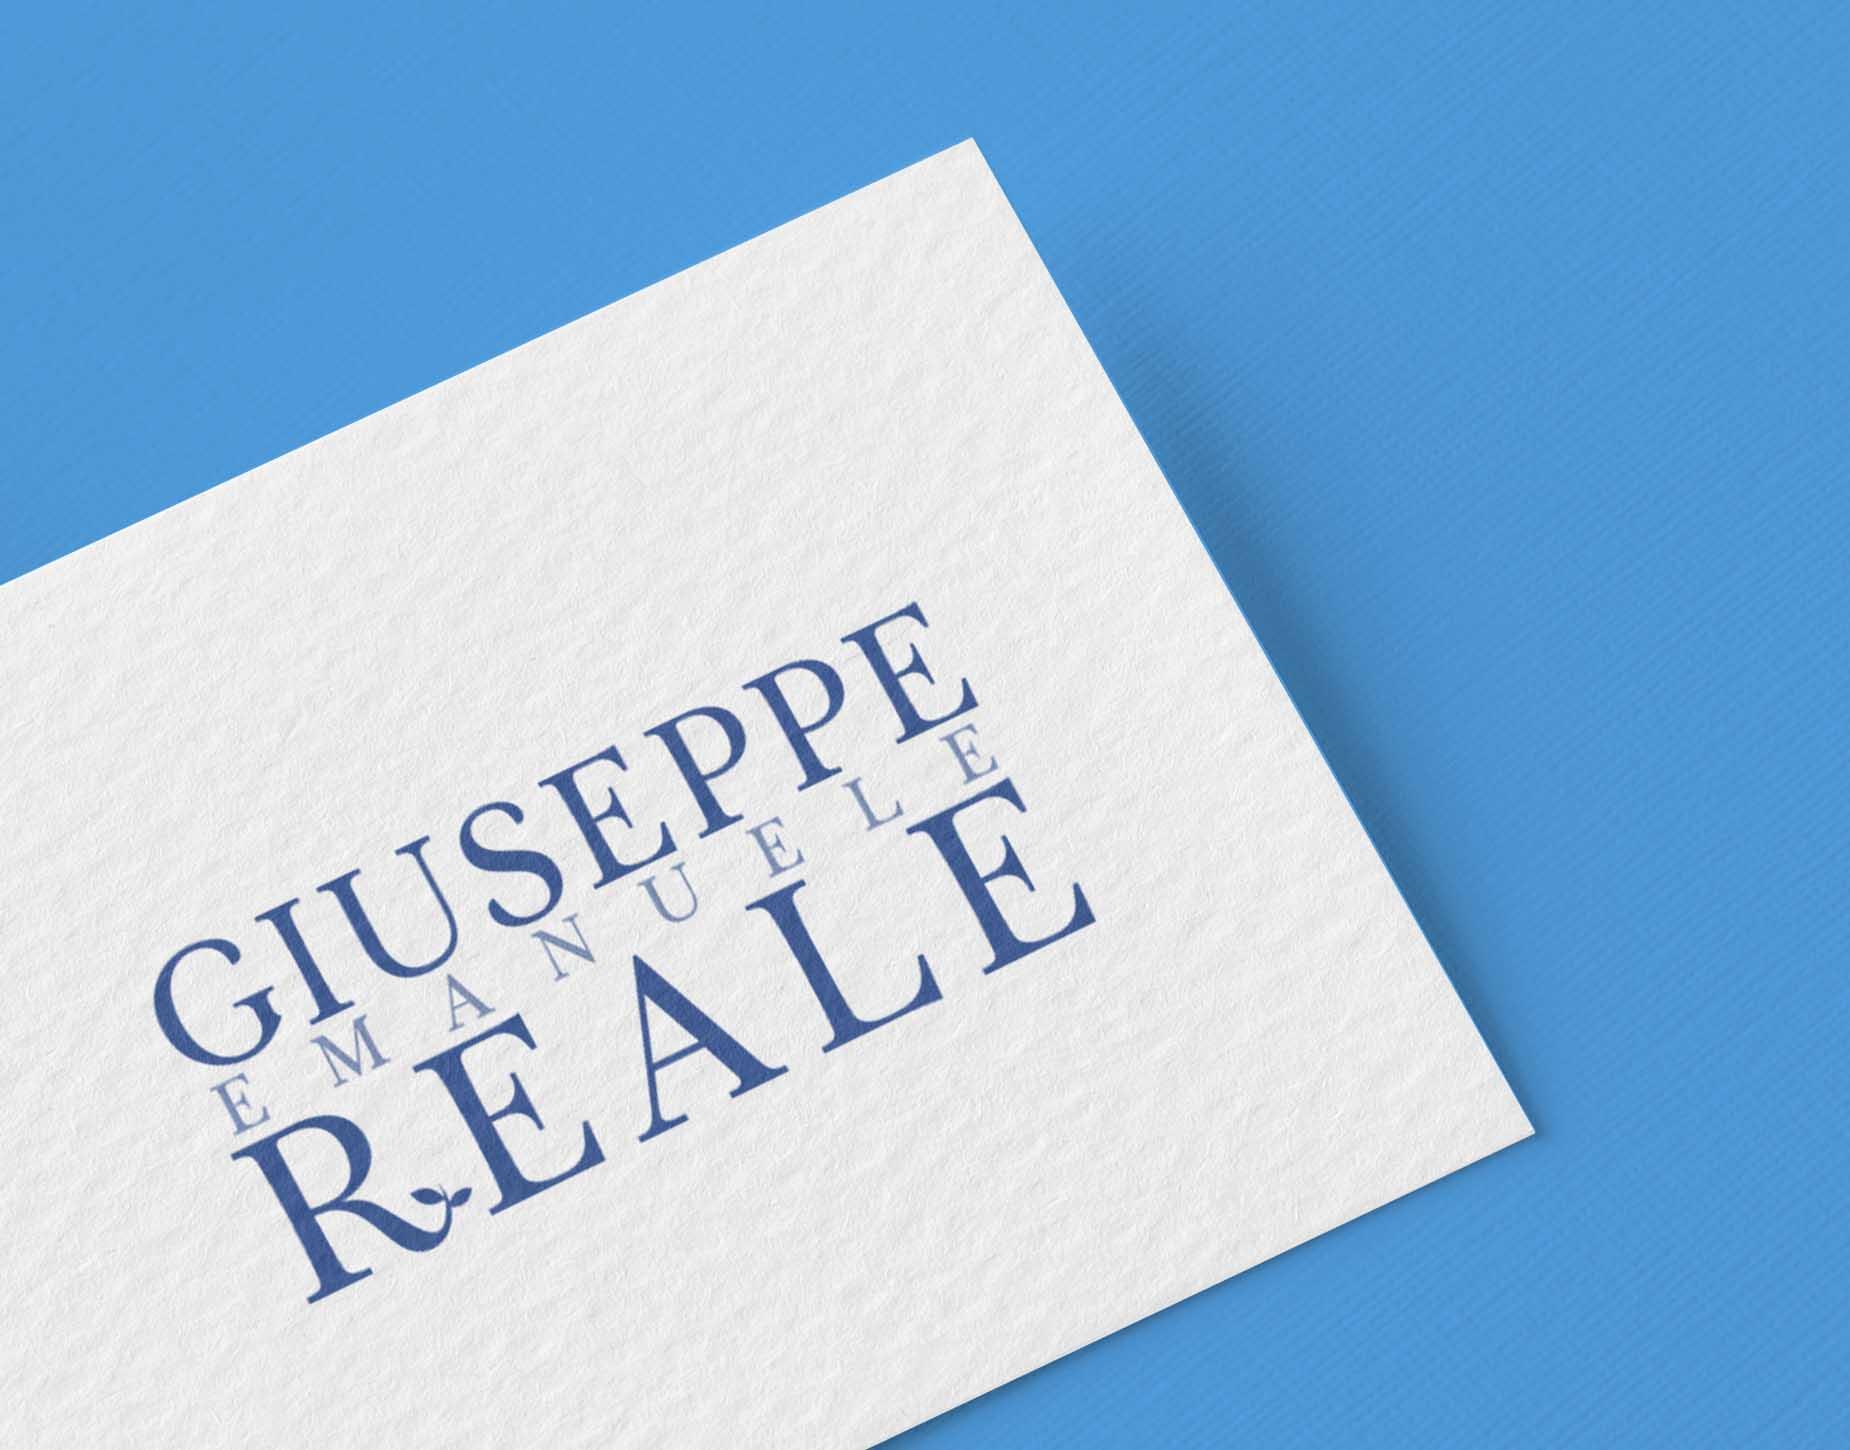 Giuseppe Reale